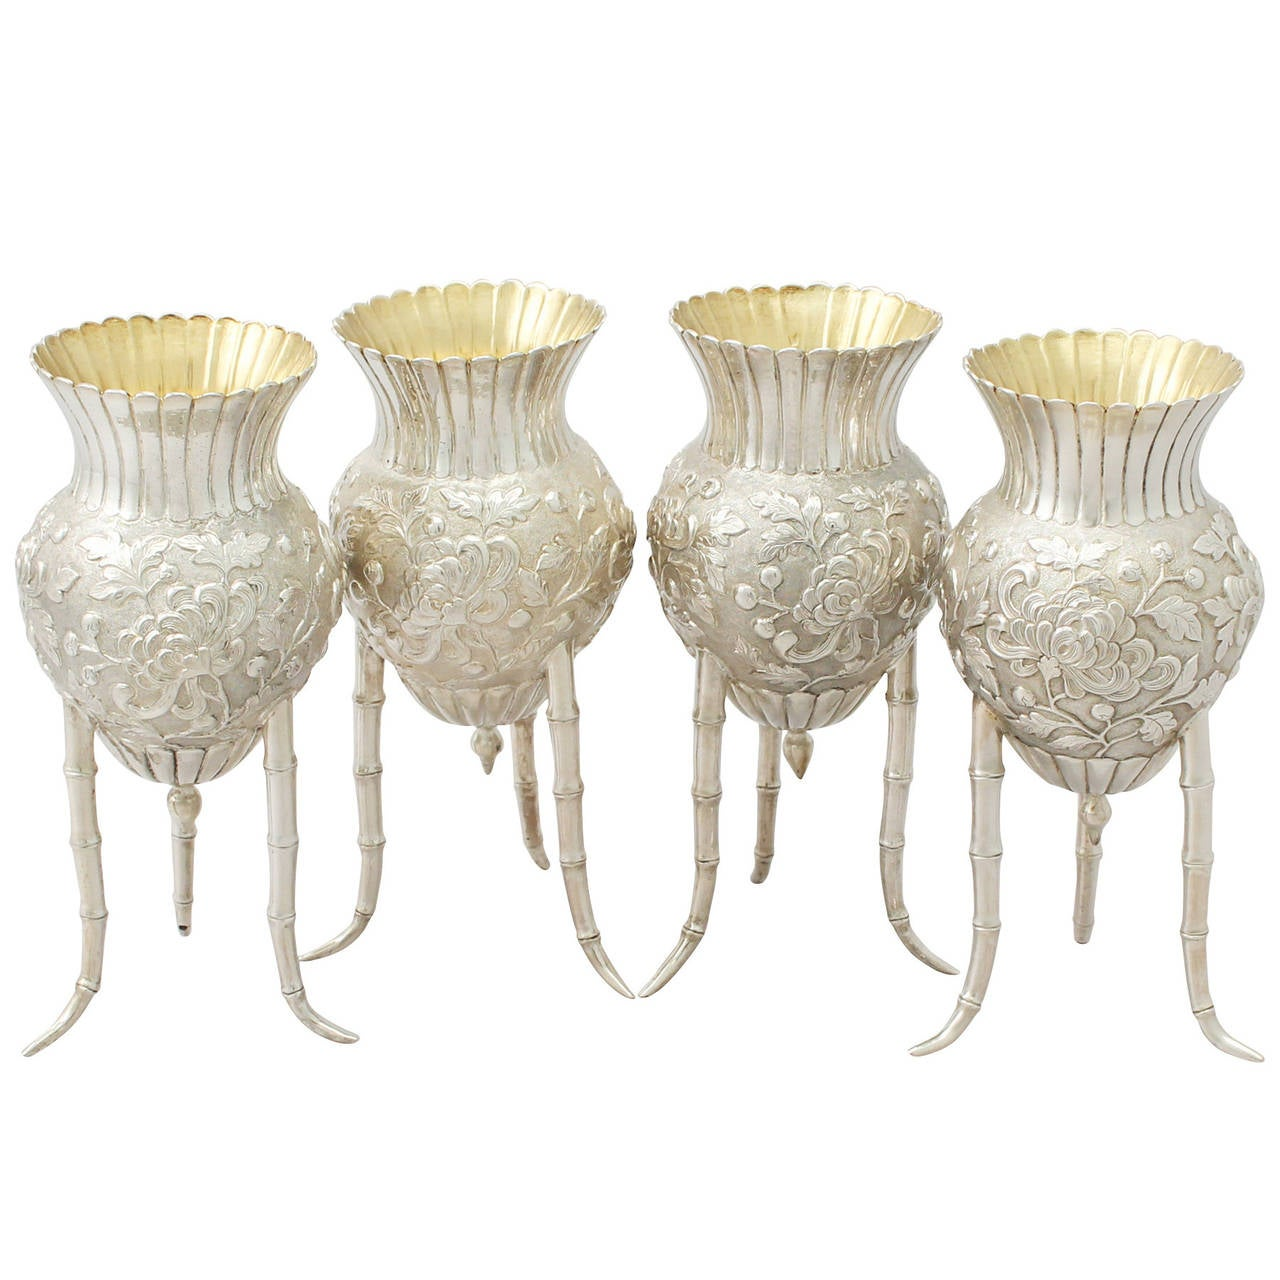 Set of Four Japanese Silver Vases, Antique, circa 1880